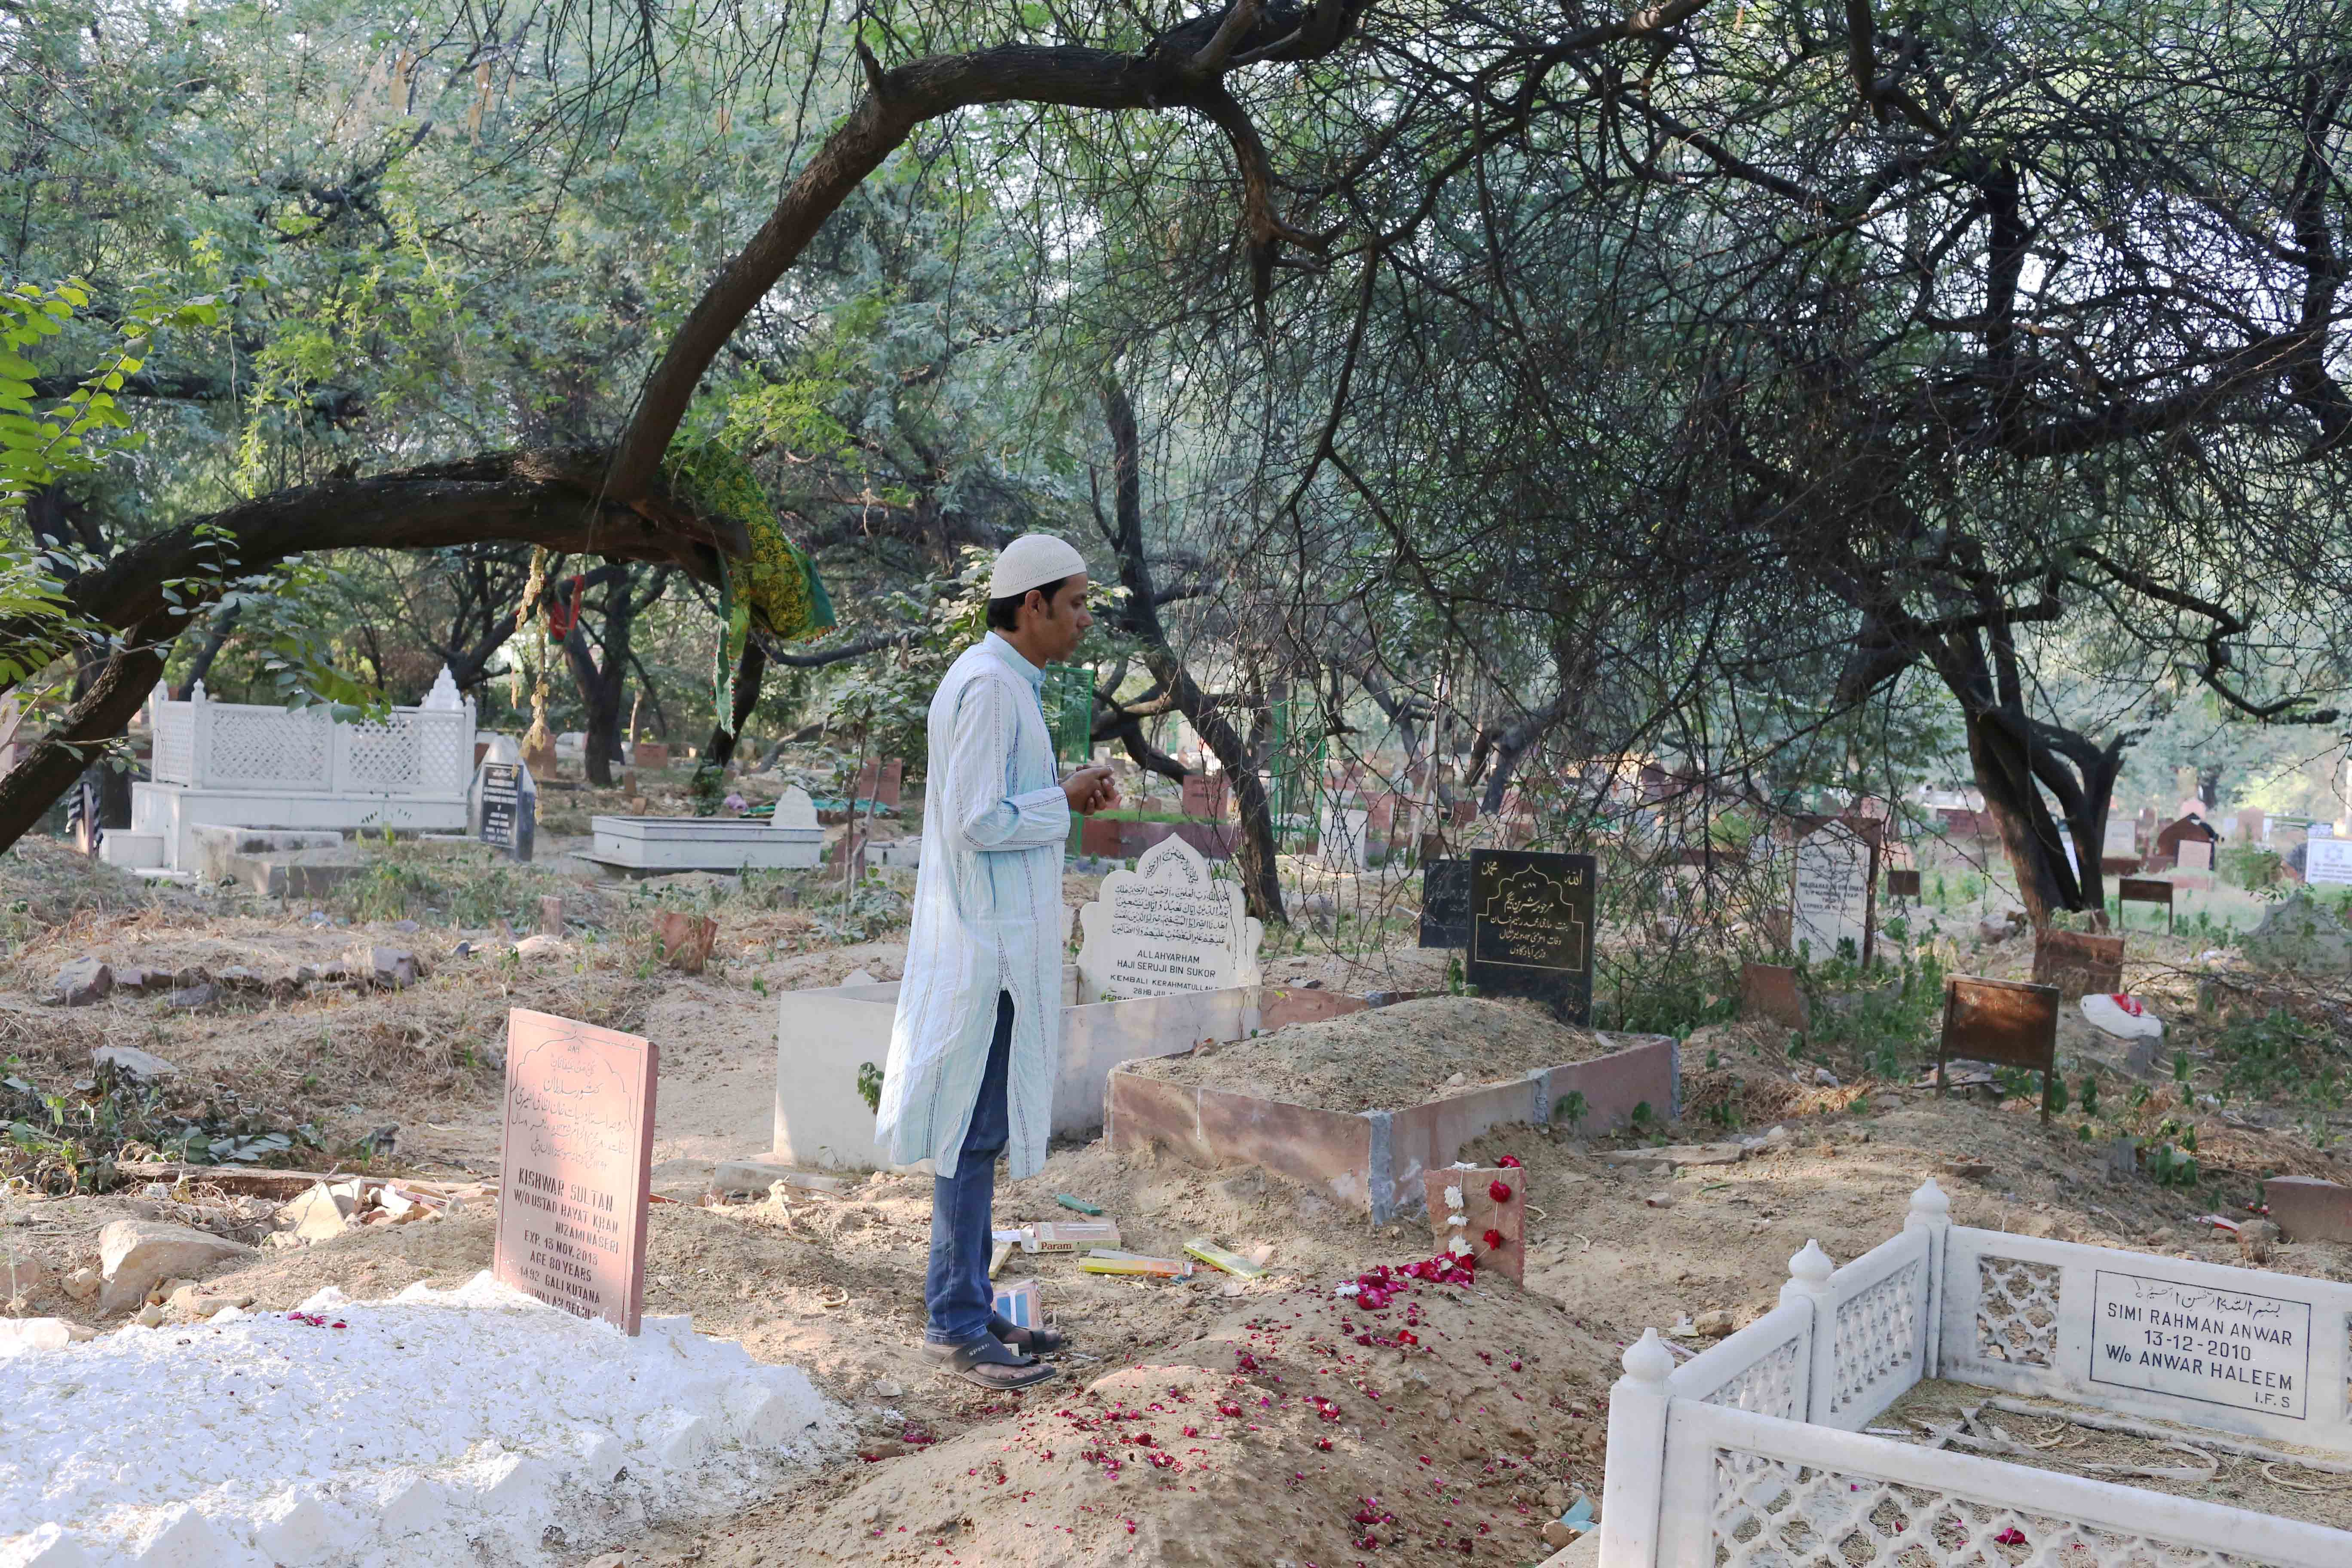 City Moment - Remembering Qawwal and Scholar Meraj Ahmed Nizami at His Grave, Panj Peeran Qabristan